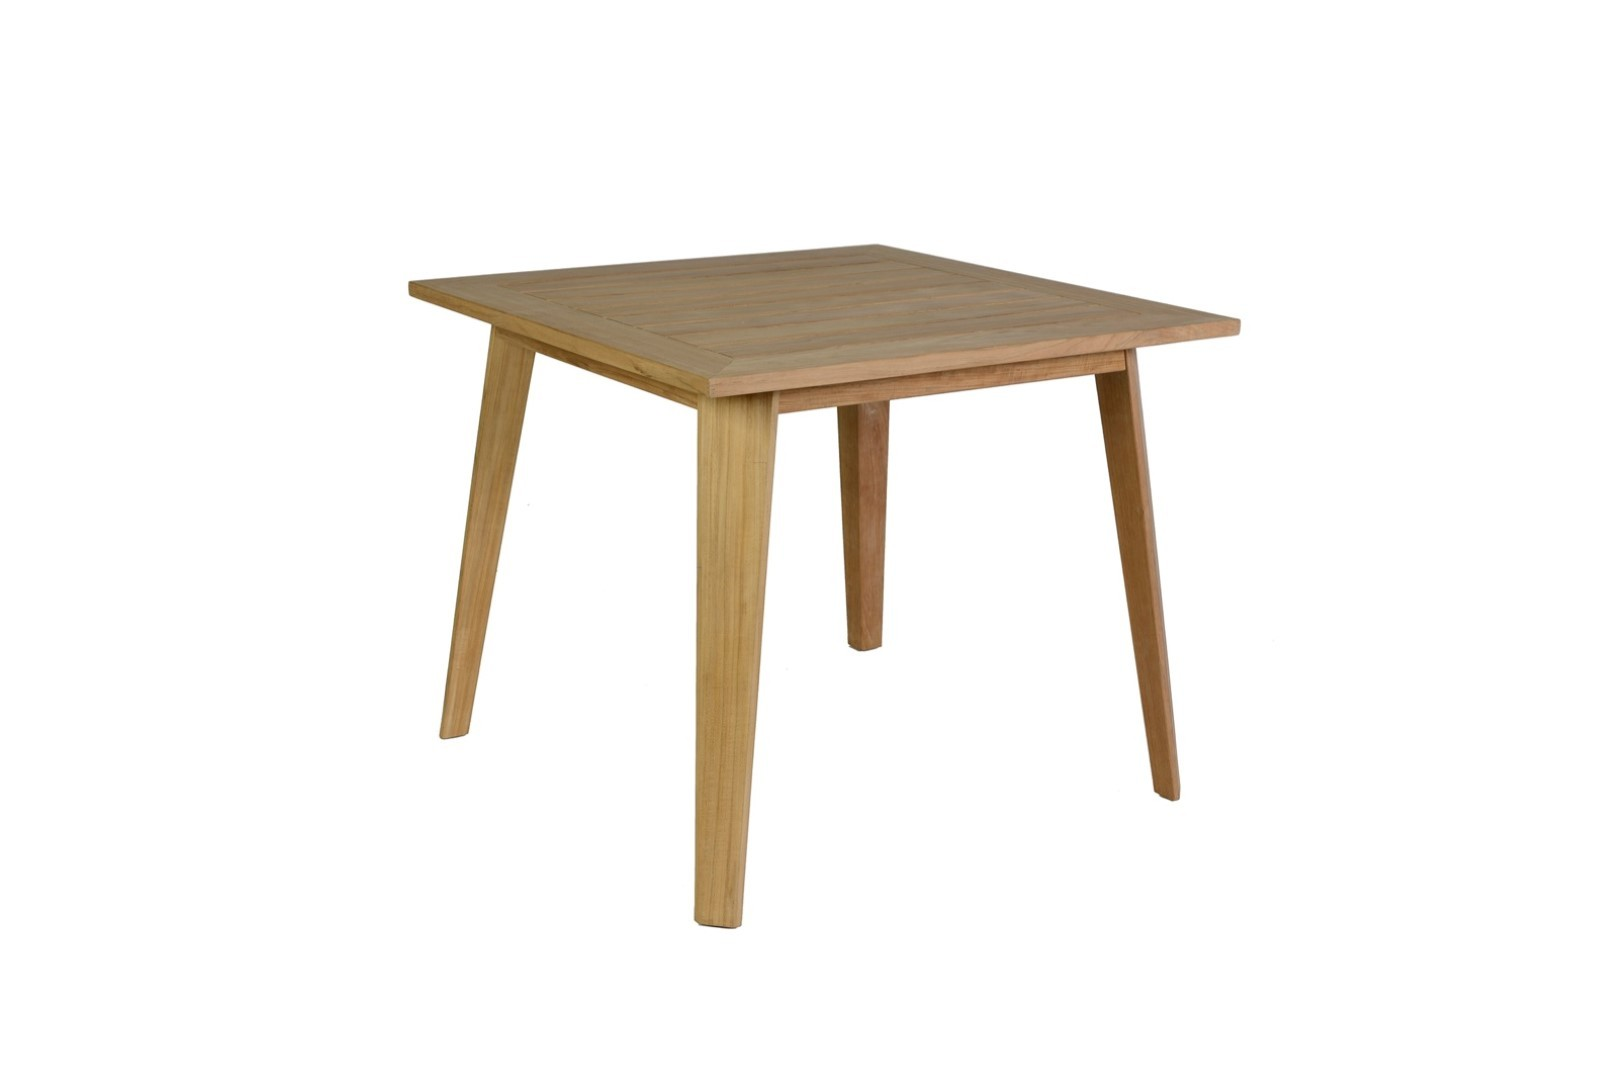 Bellinzona tafel 90x90x75 cm teak